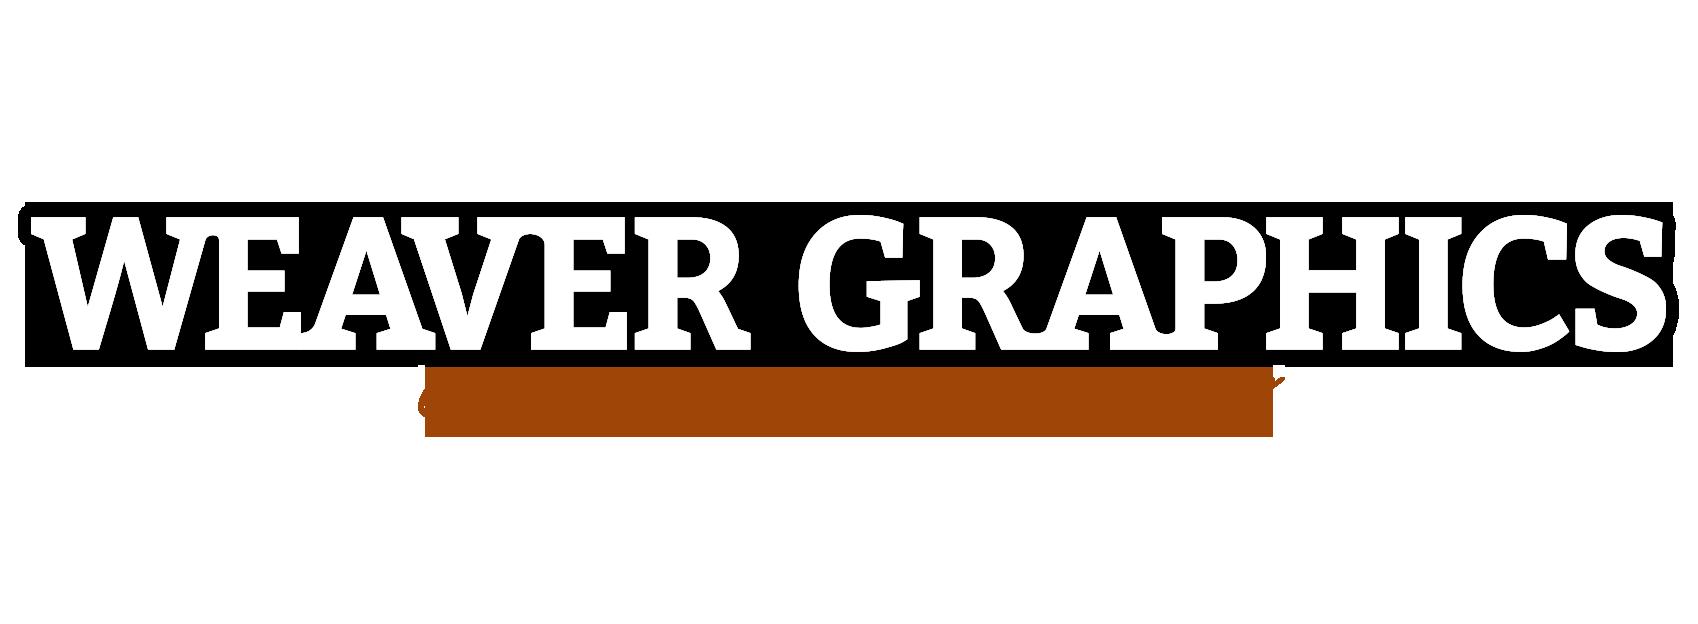 Weaver Graphics